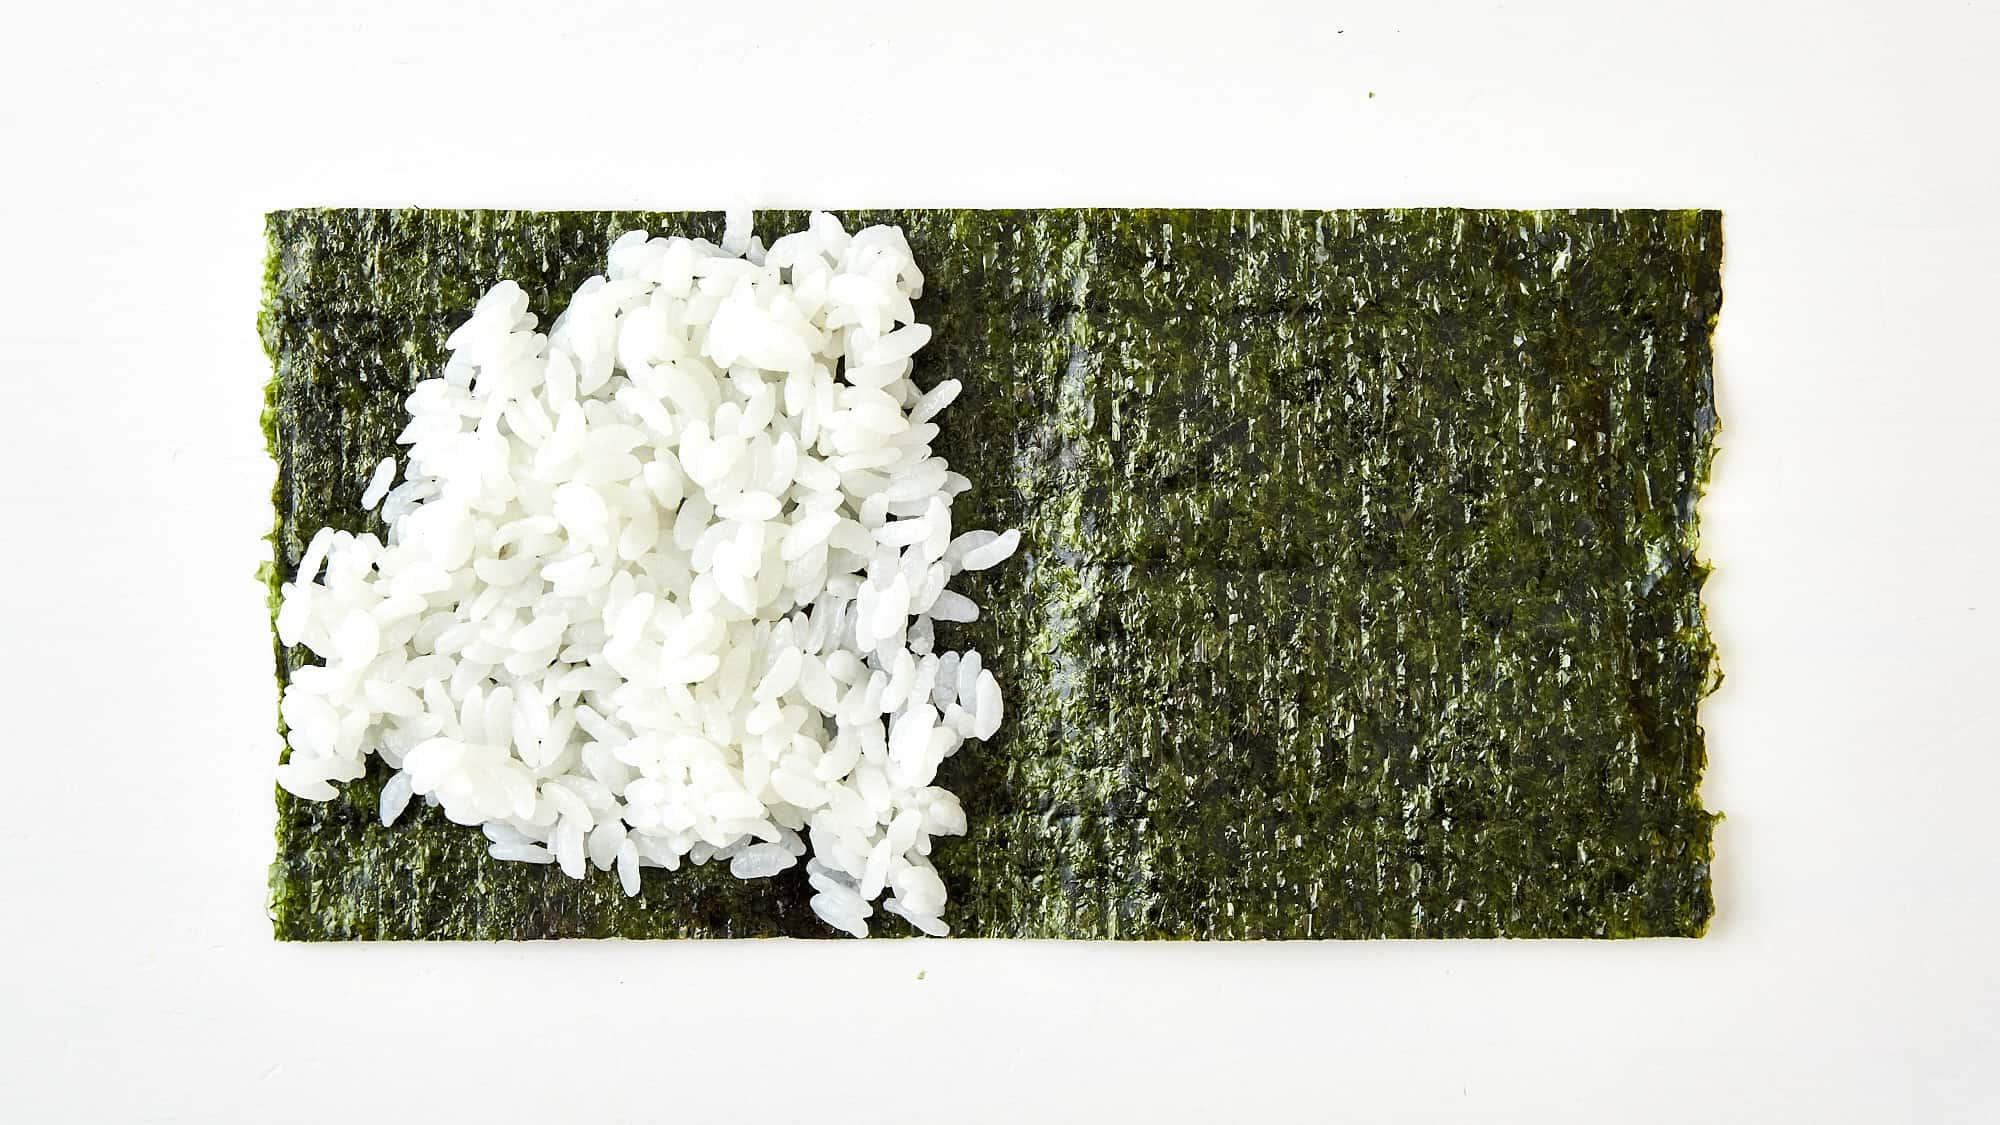 Spread the rice out into a triangle over half the nori.